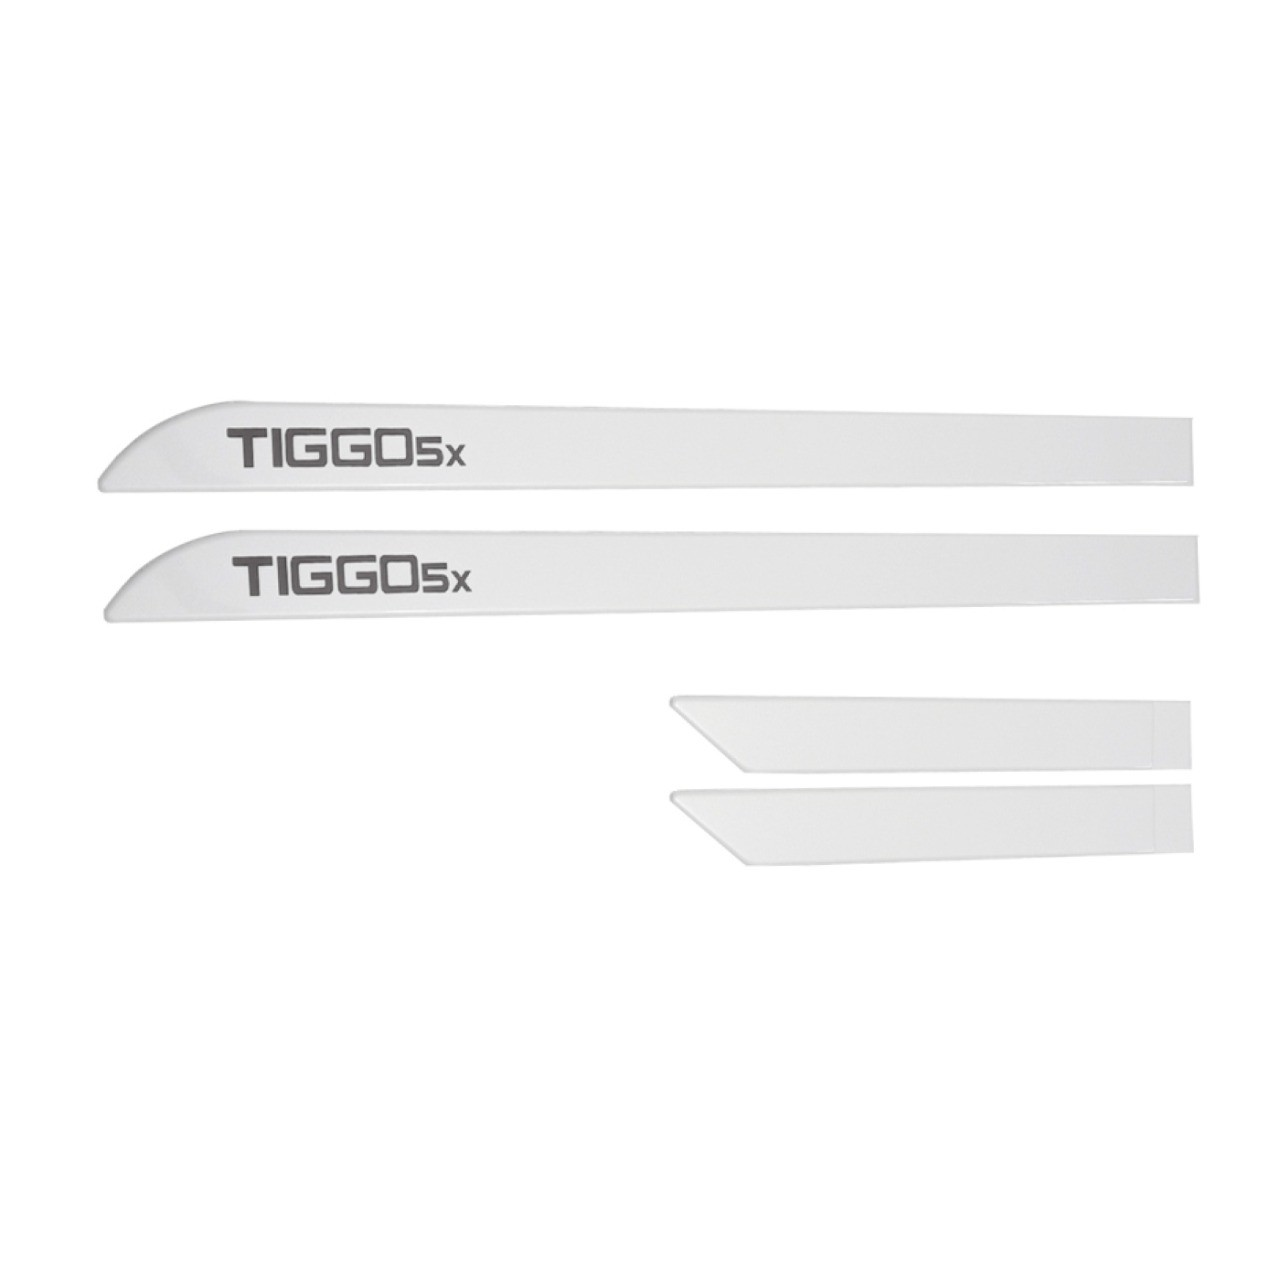 Friso Lateral Chery Tiggo 5X Branco Perolizado Personalizado